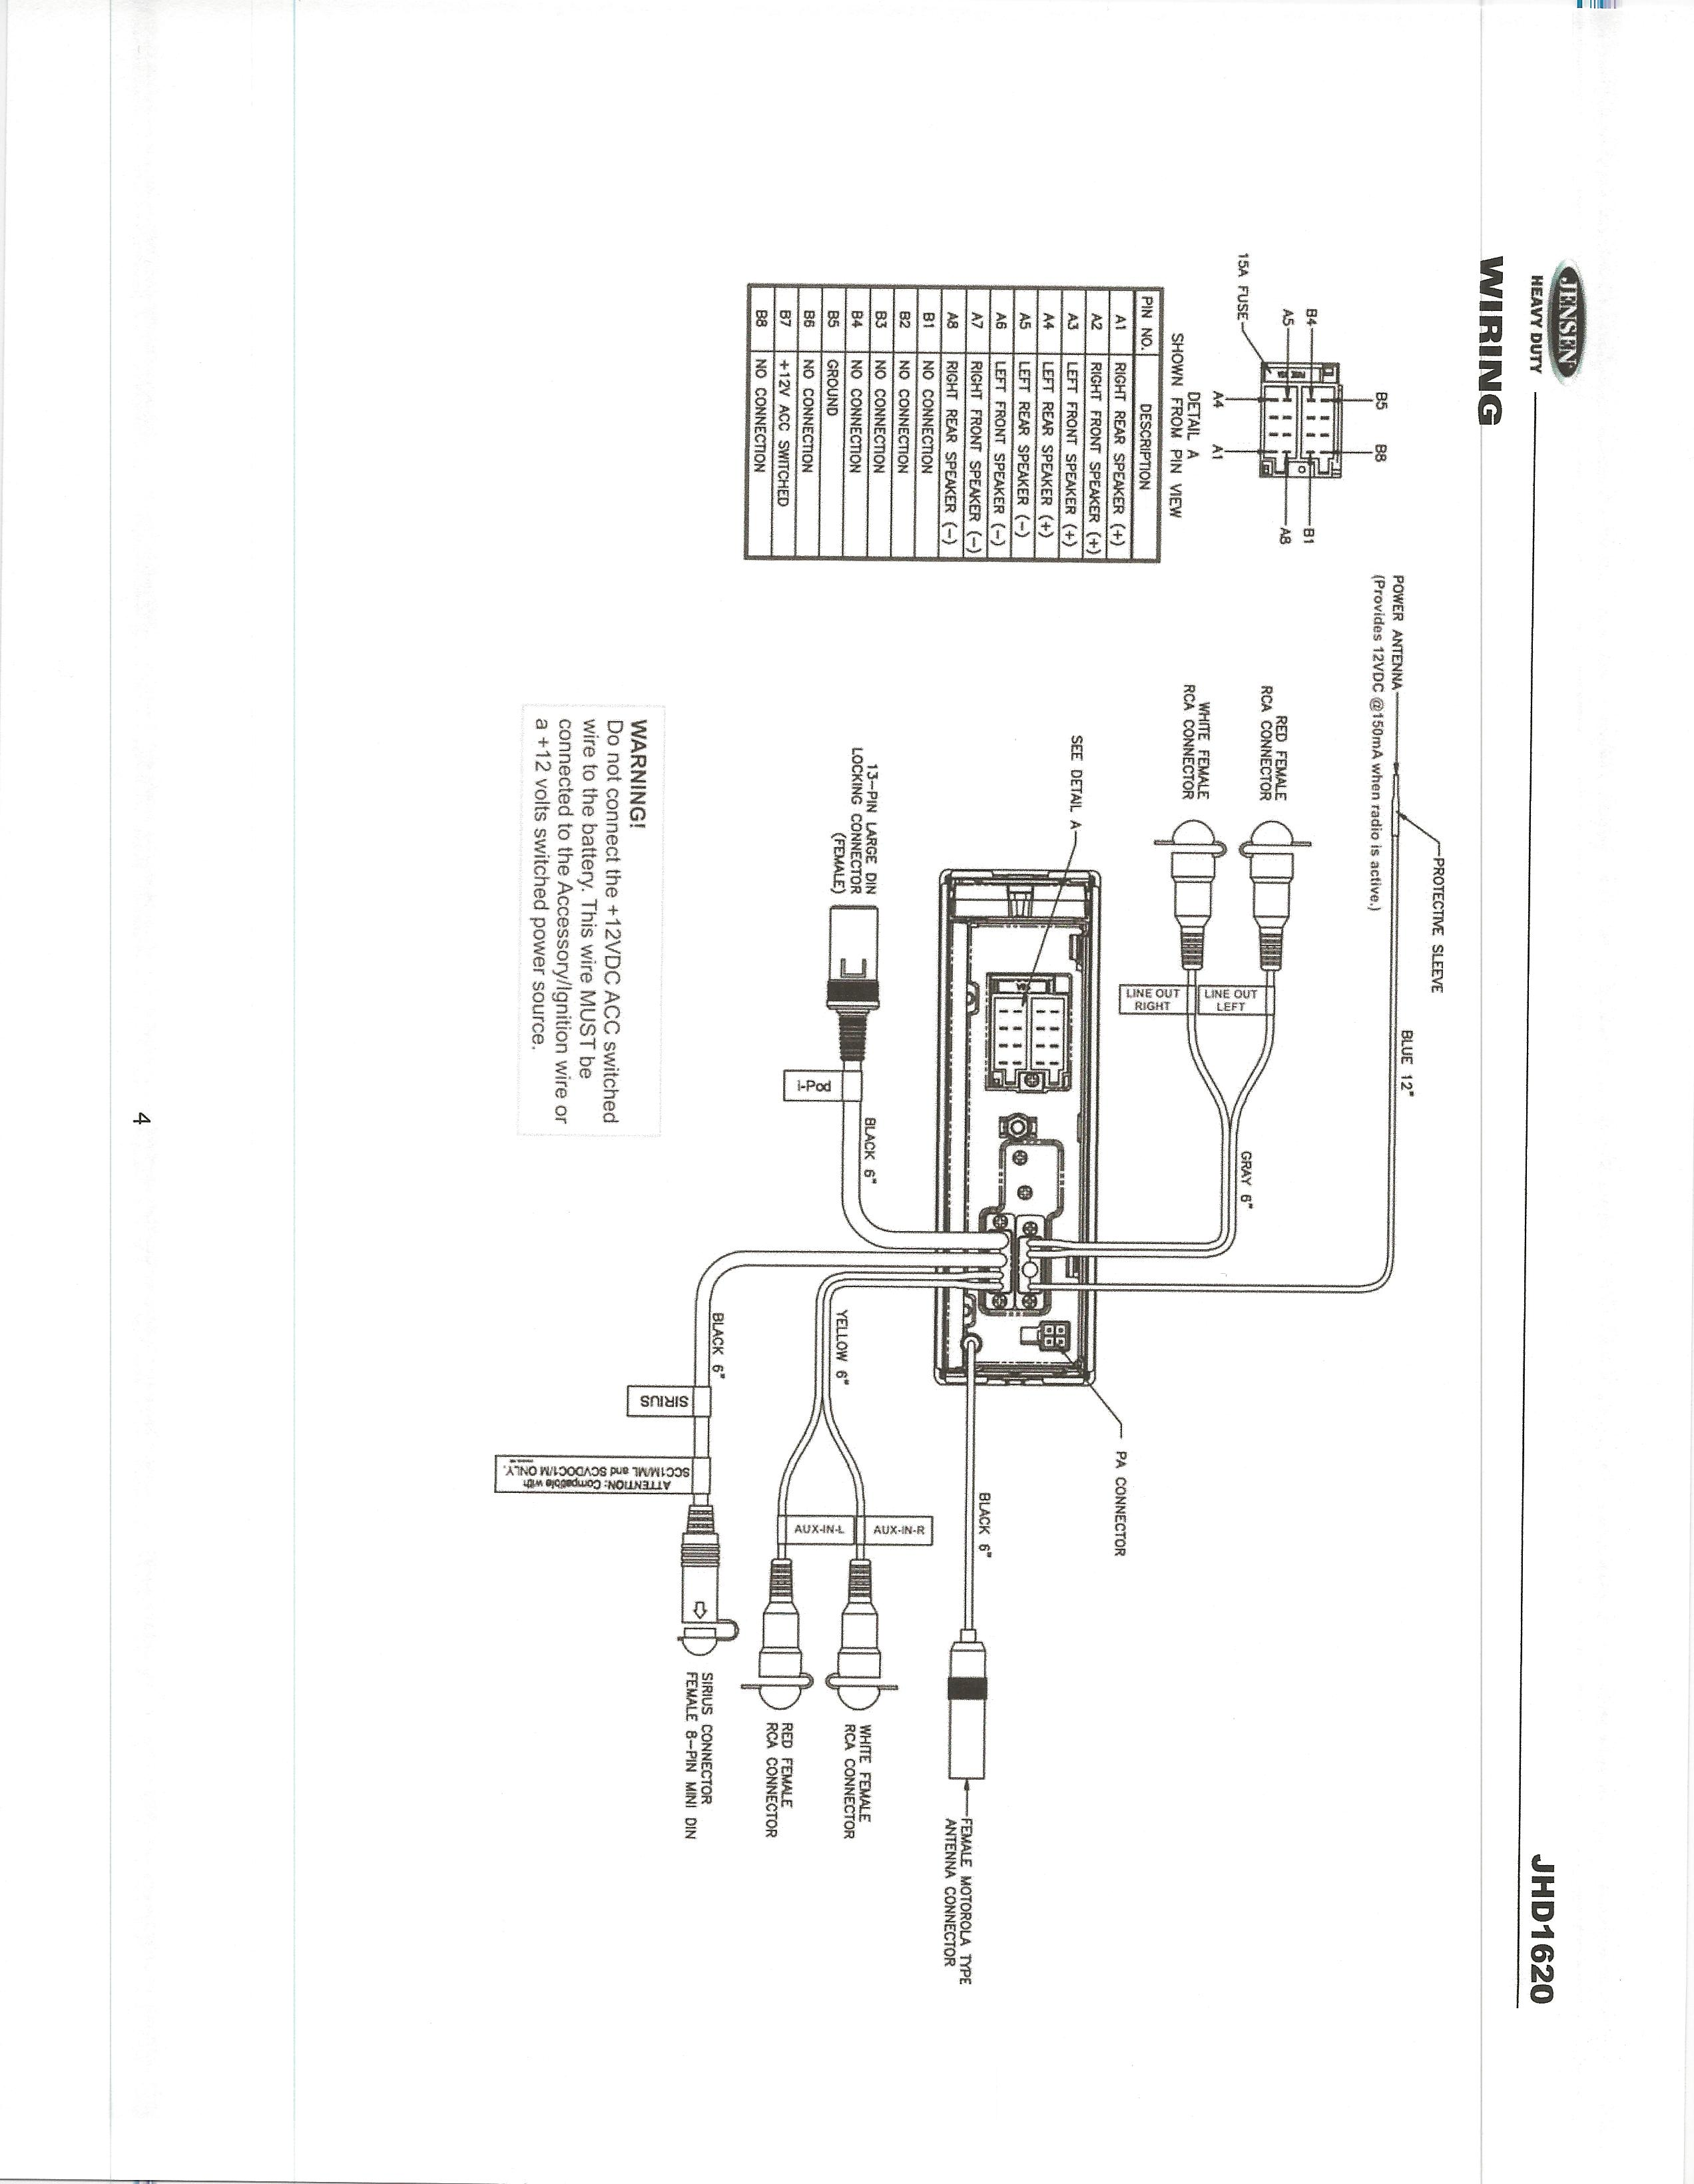 [SCHEMATICS_4FD]  CX_5166] Tractor Radio Wiring Harness Schematic Wiring   Kubota Tractor Radio Wiring Diagram      Xolia Frag Xempag Elia Akeb Unec Frag Mohammedshrine Librar Wiring 101